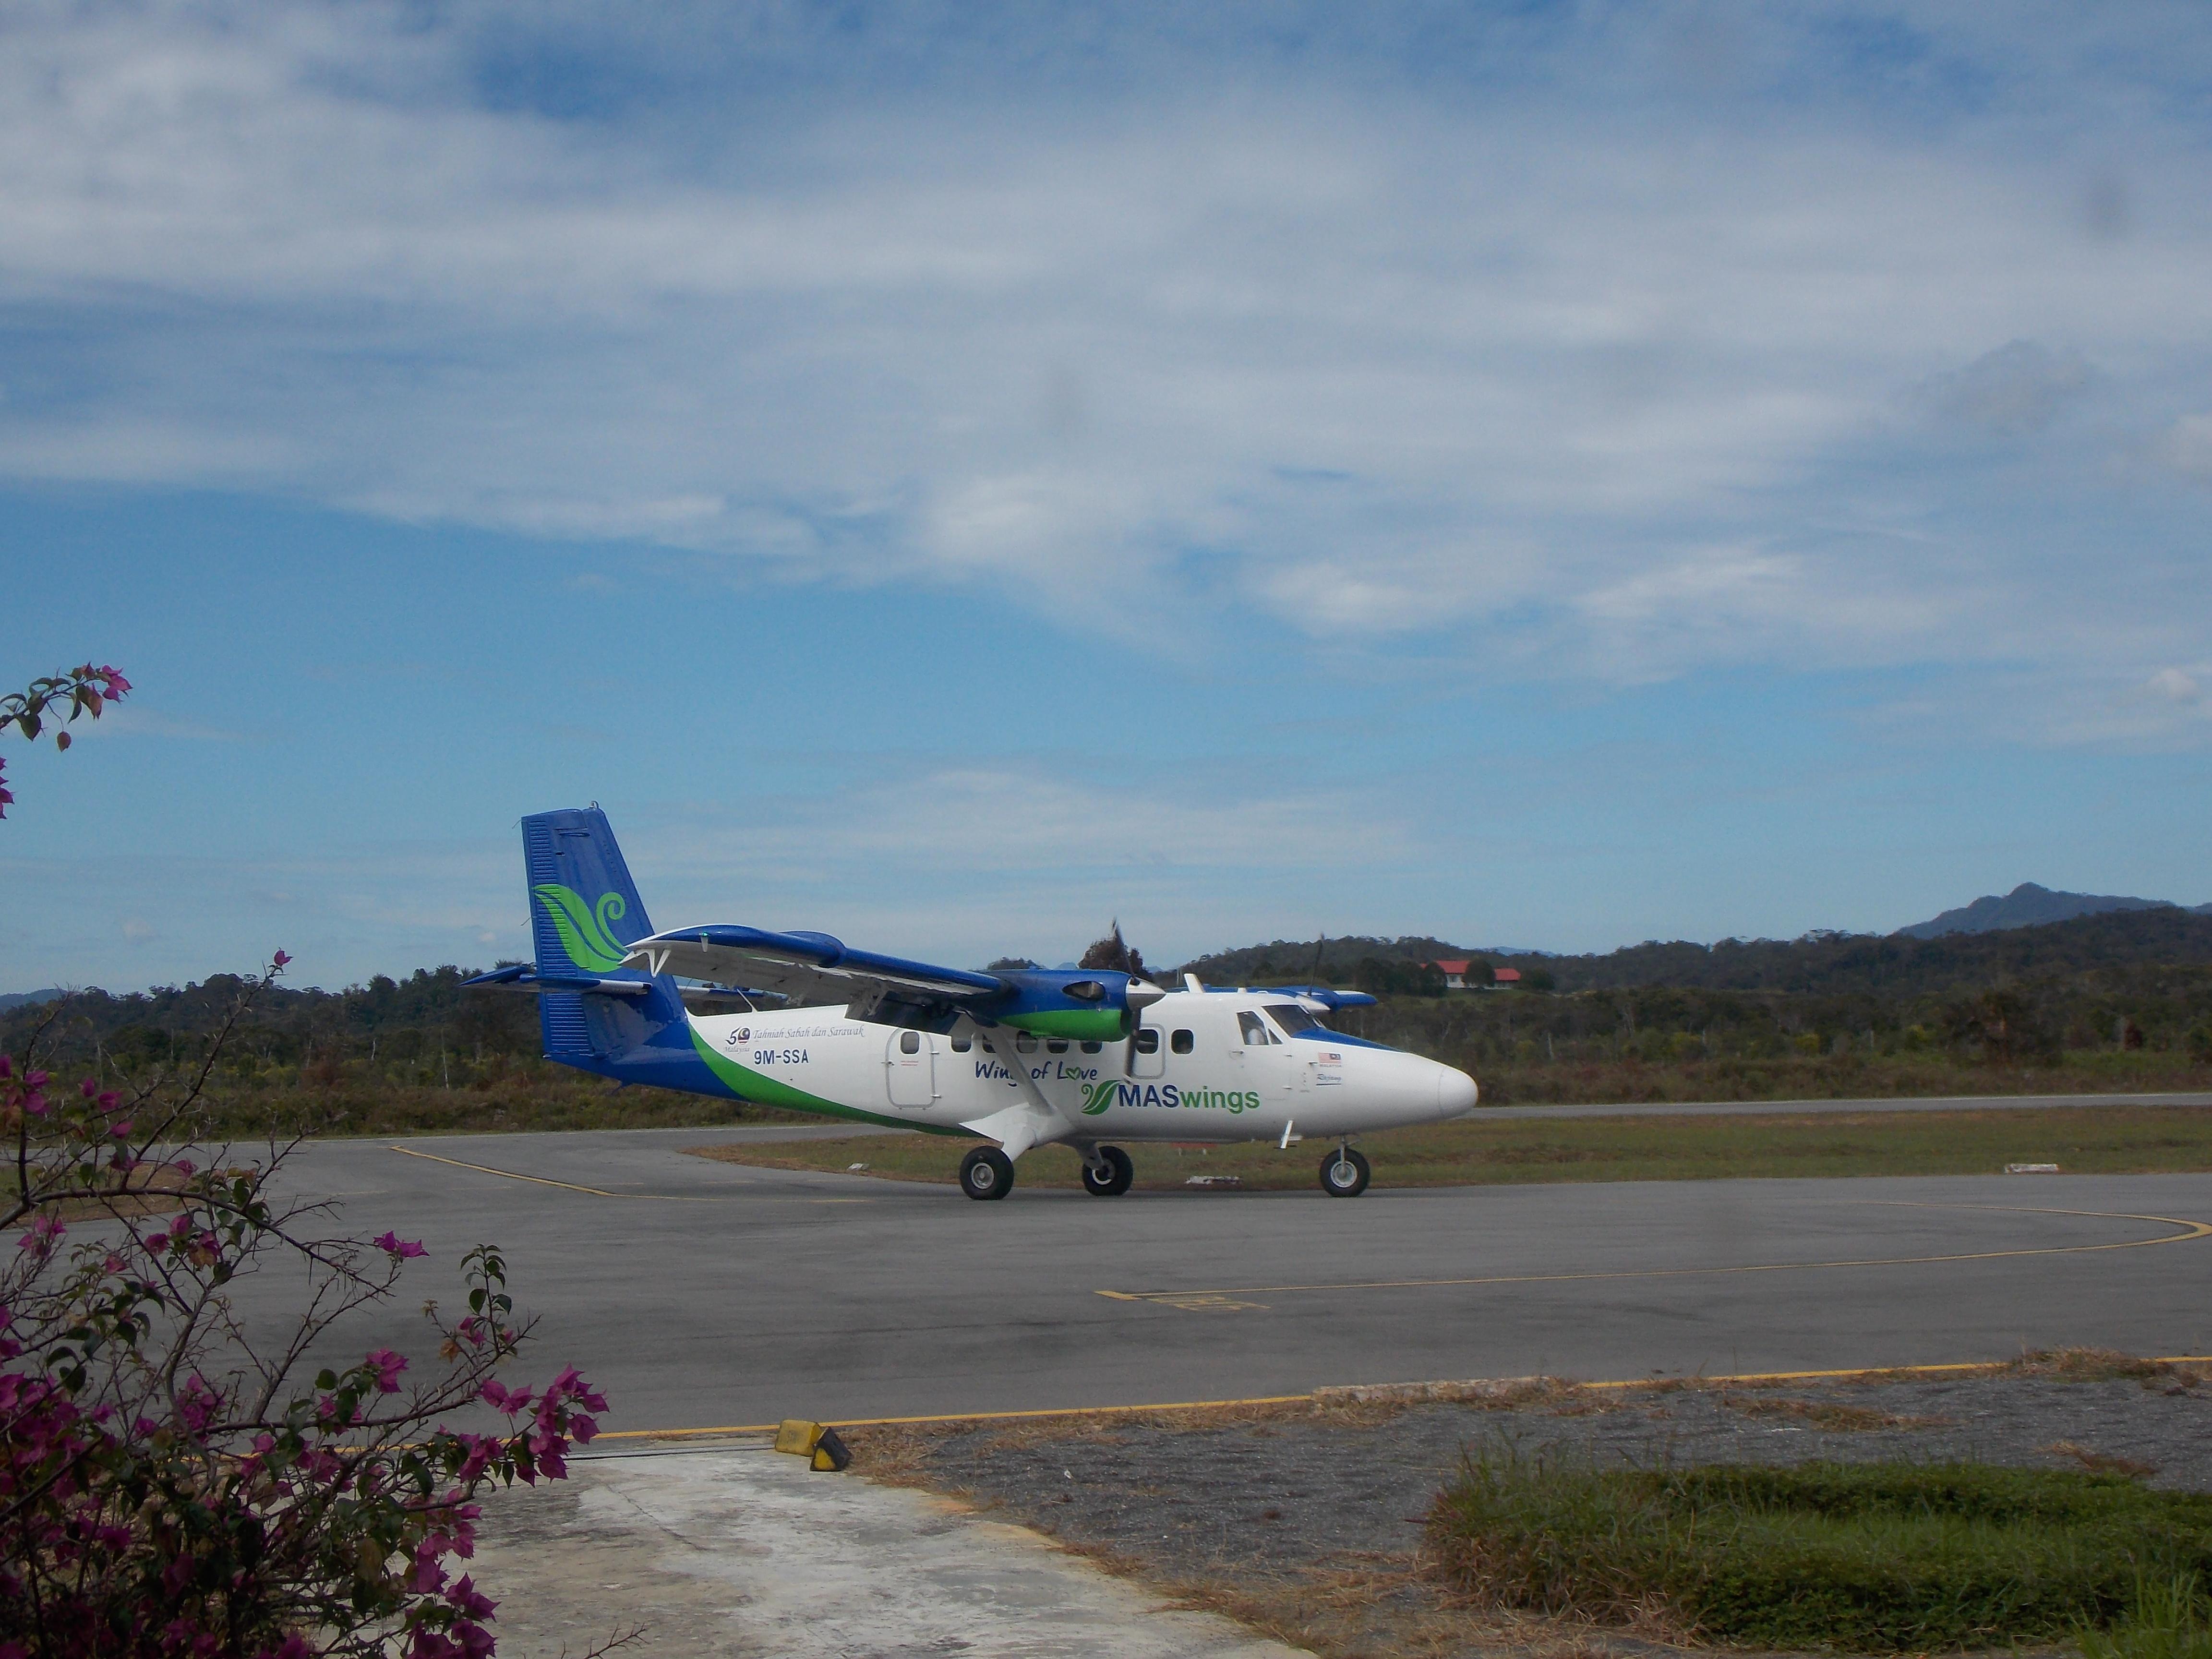 196-prop-plane-at-bario-airport